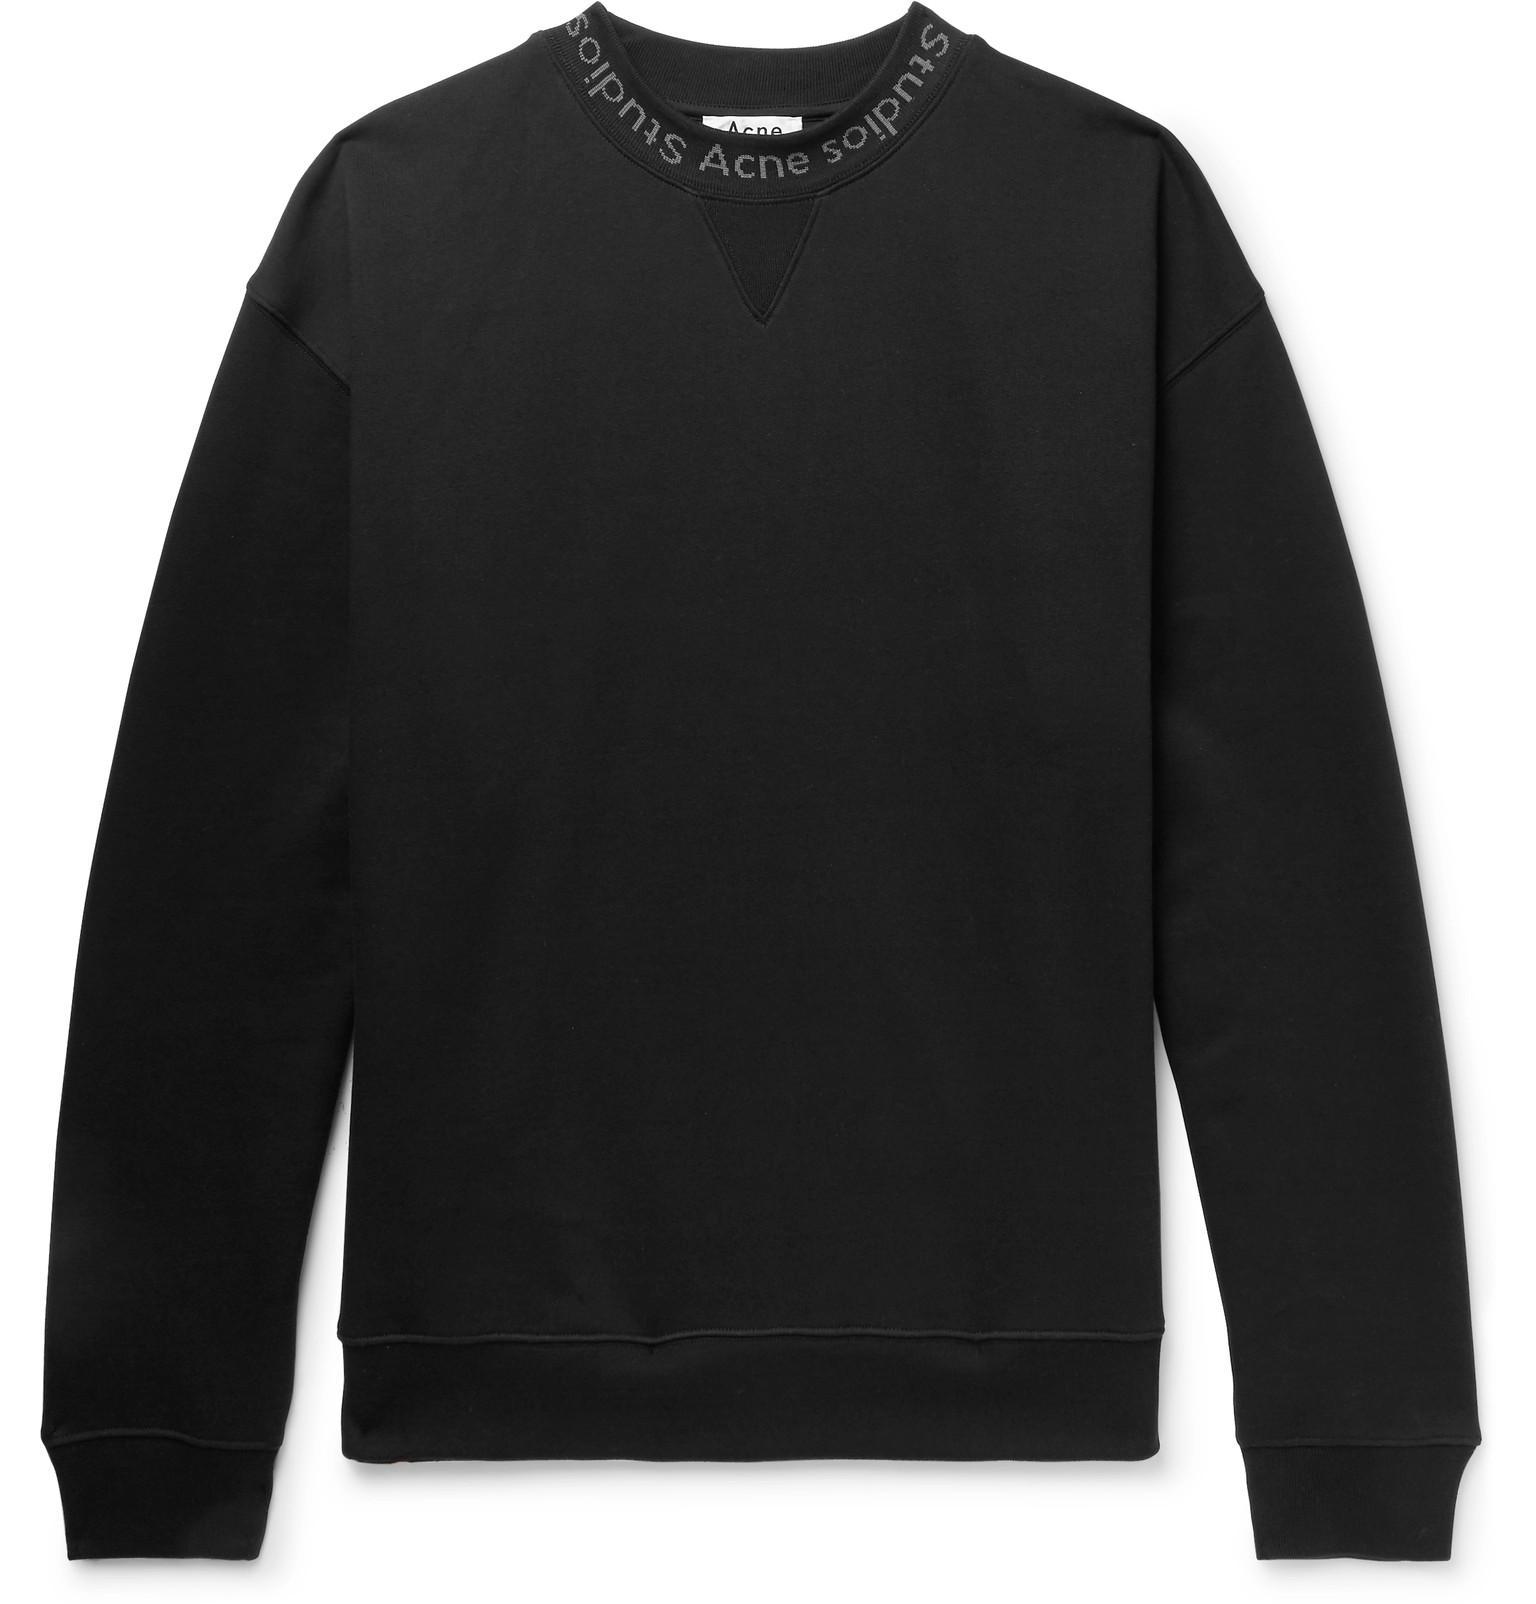 Studios Print Black Fleece Back Jersey Sweatshirt Flogho Logo Men's Acne Cotton FqUfOq